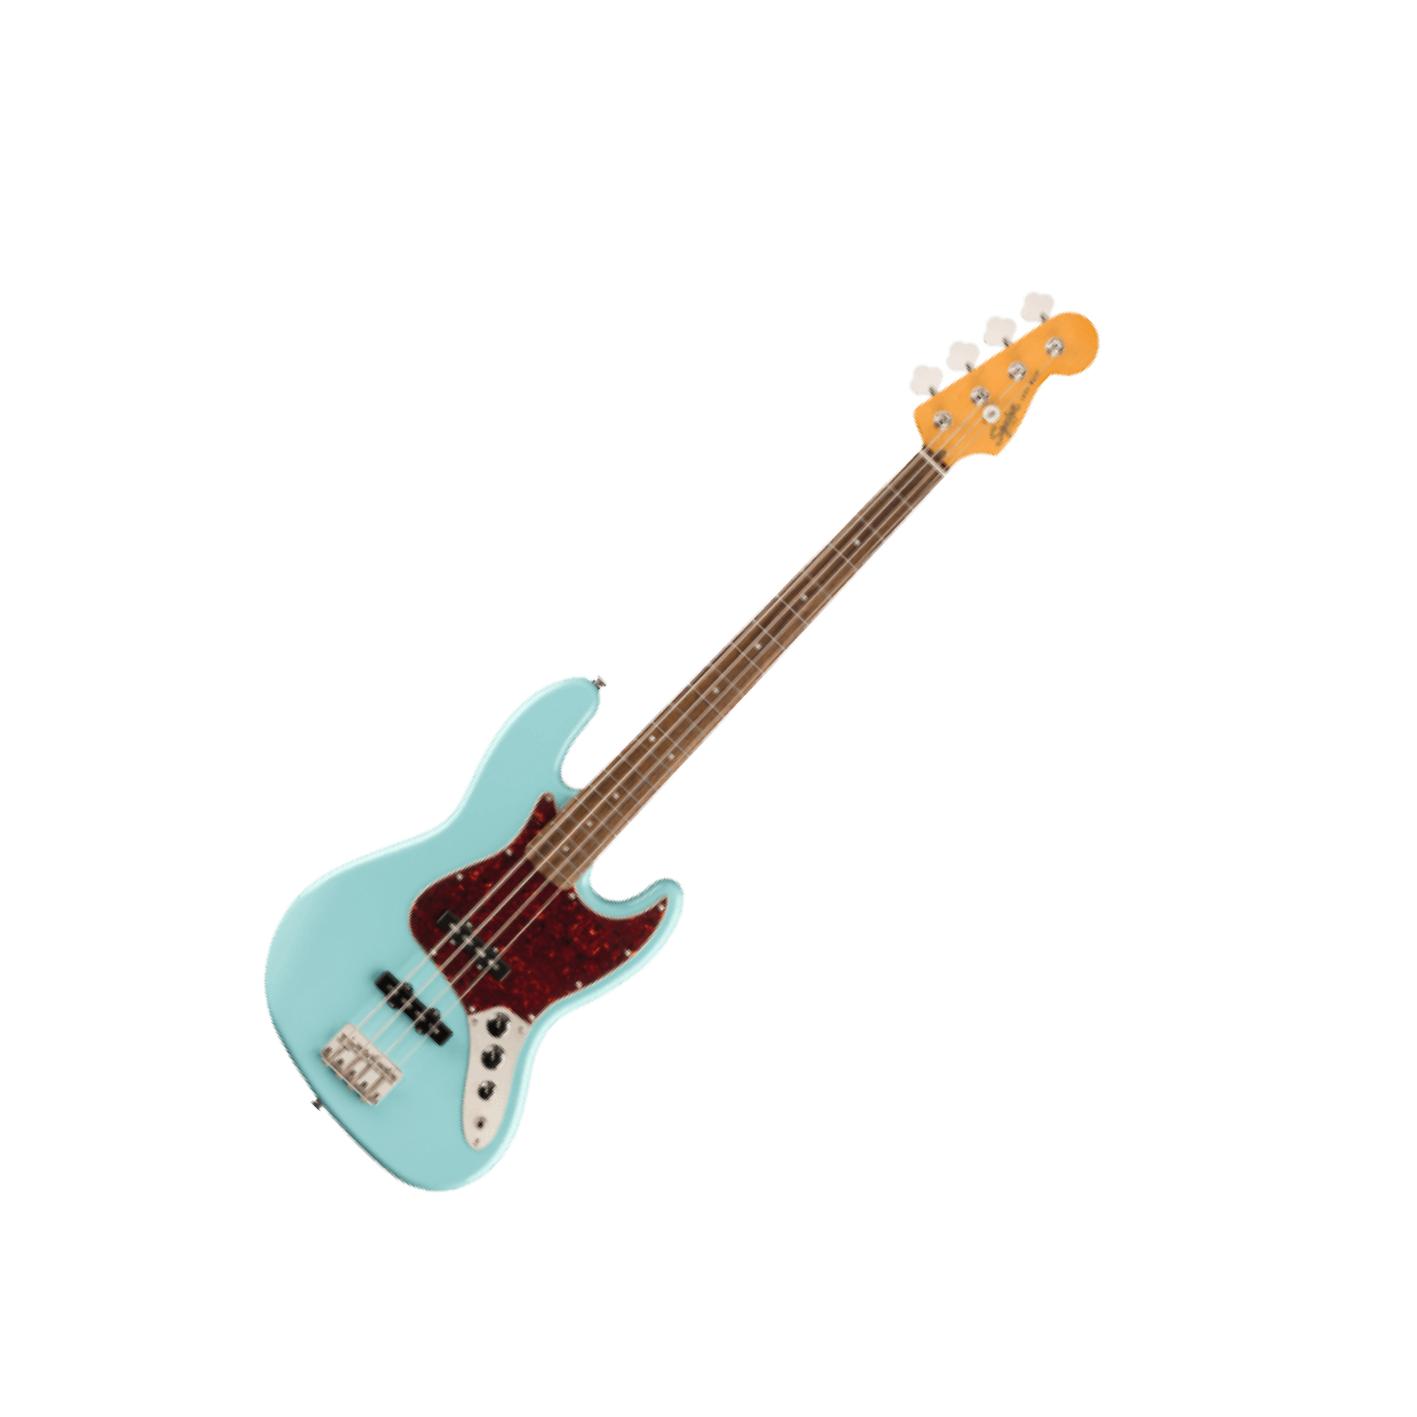 Squier Classic Vibe 60s Jazz Bass Daphne Blue